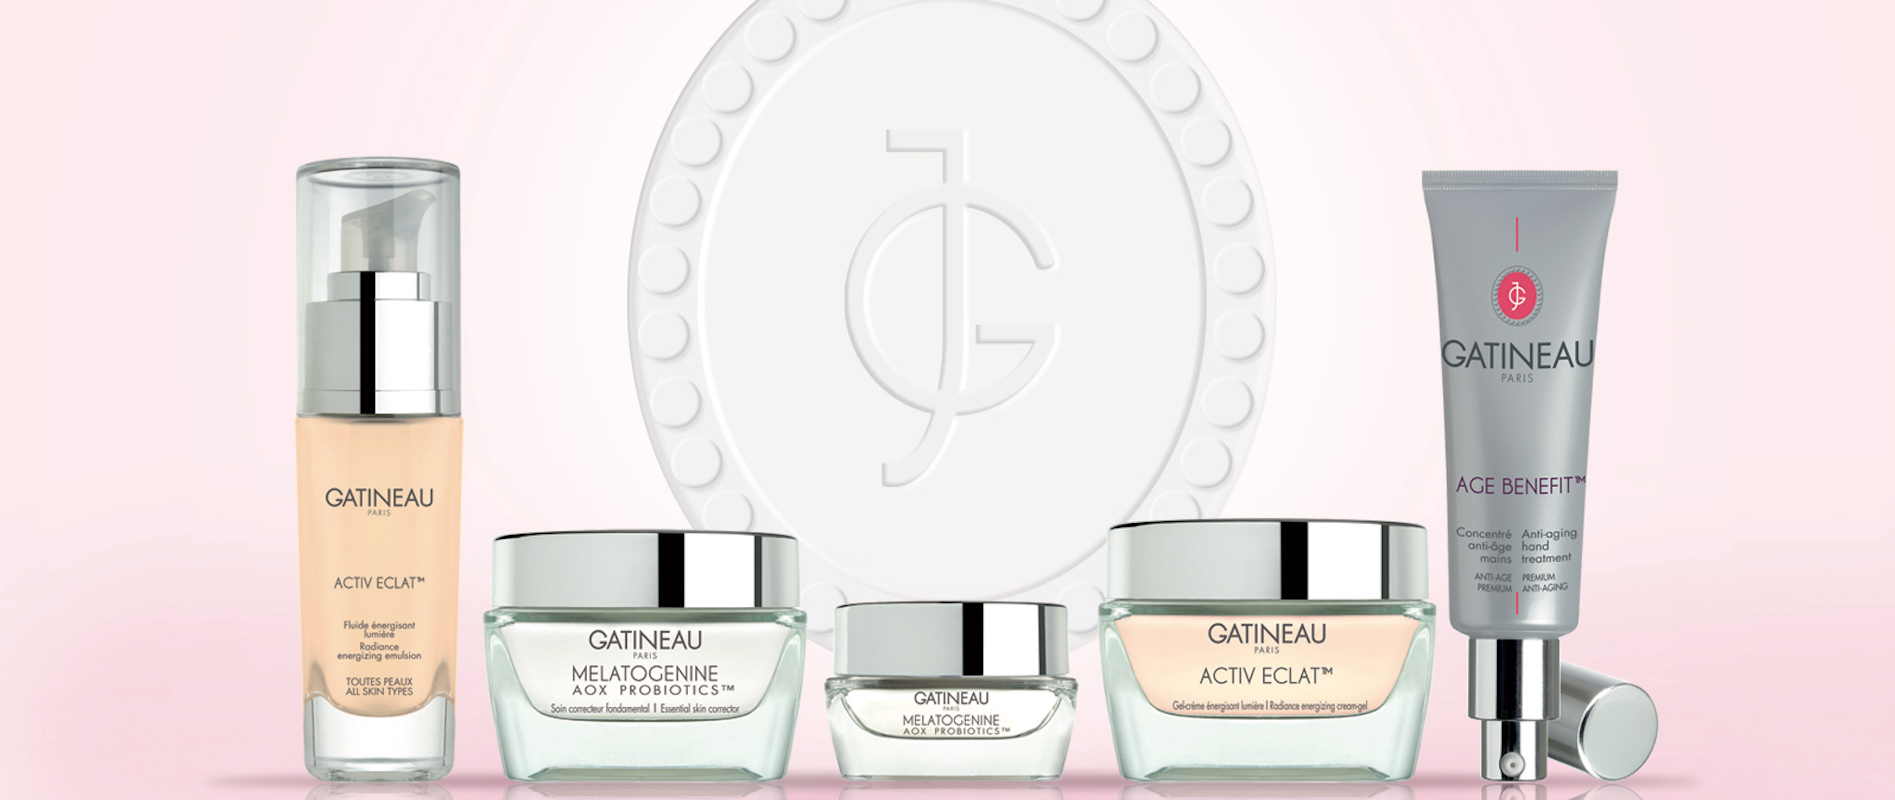 Gatineau(法國 嘉迪諾專業化妝品)